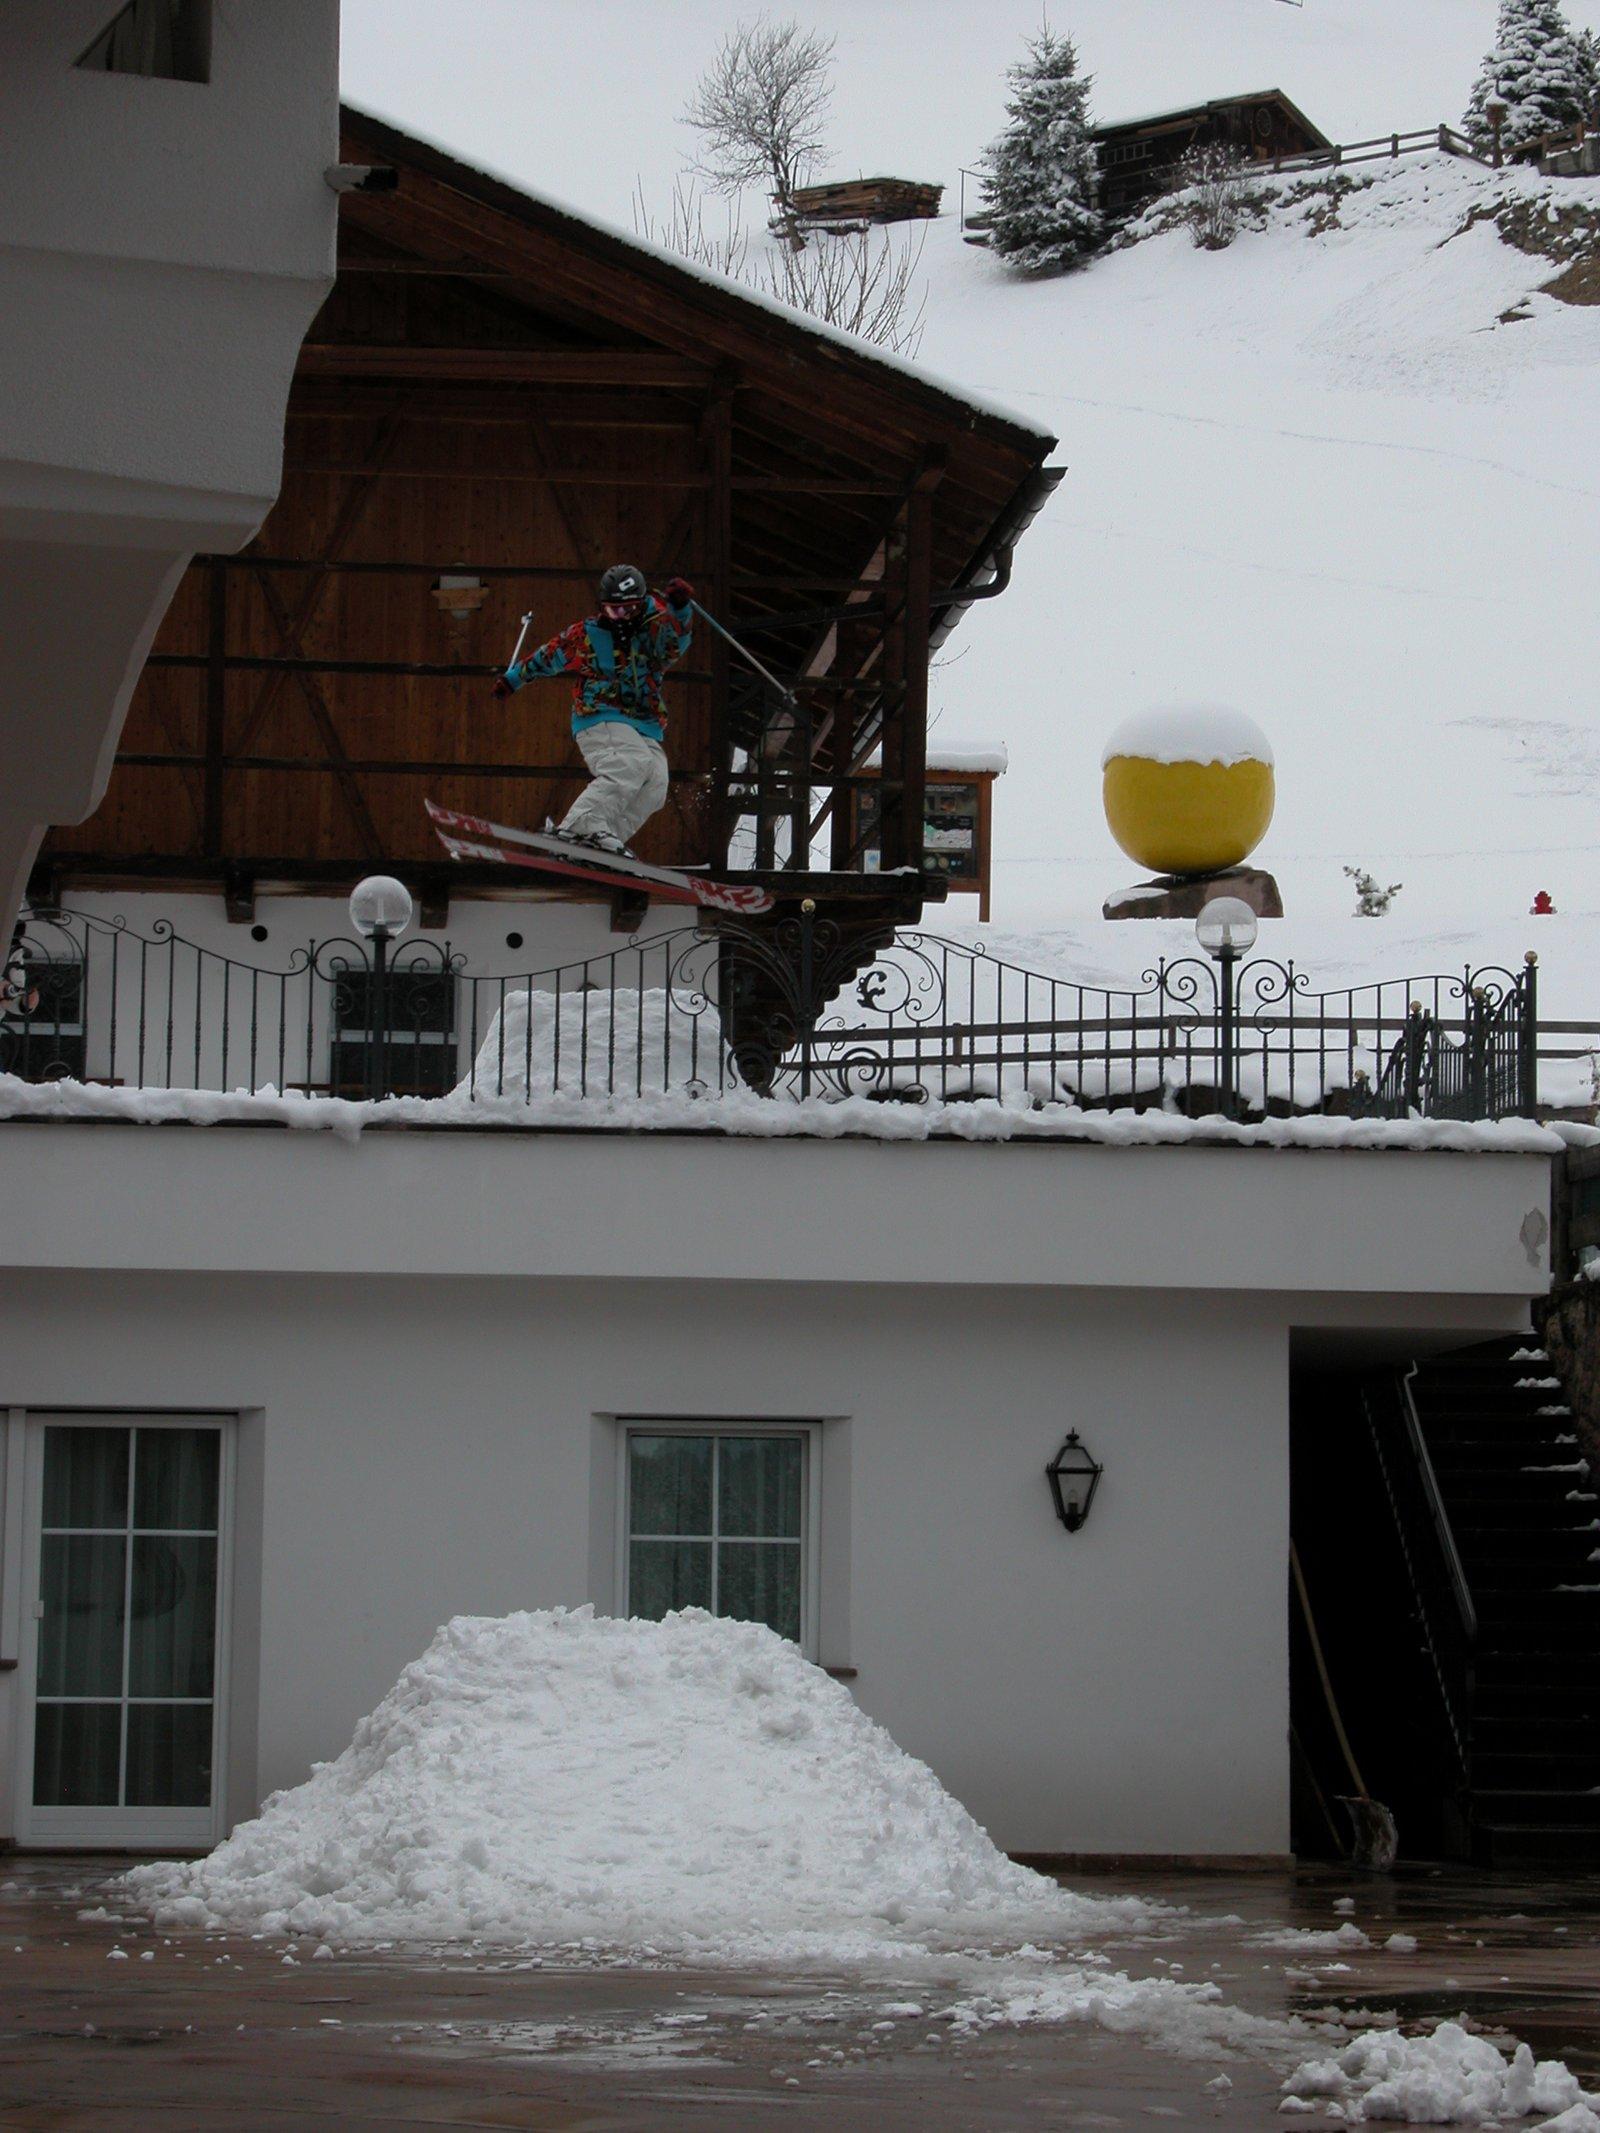 Stefan Schenk Drop Down